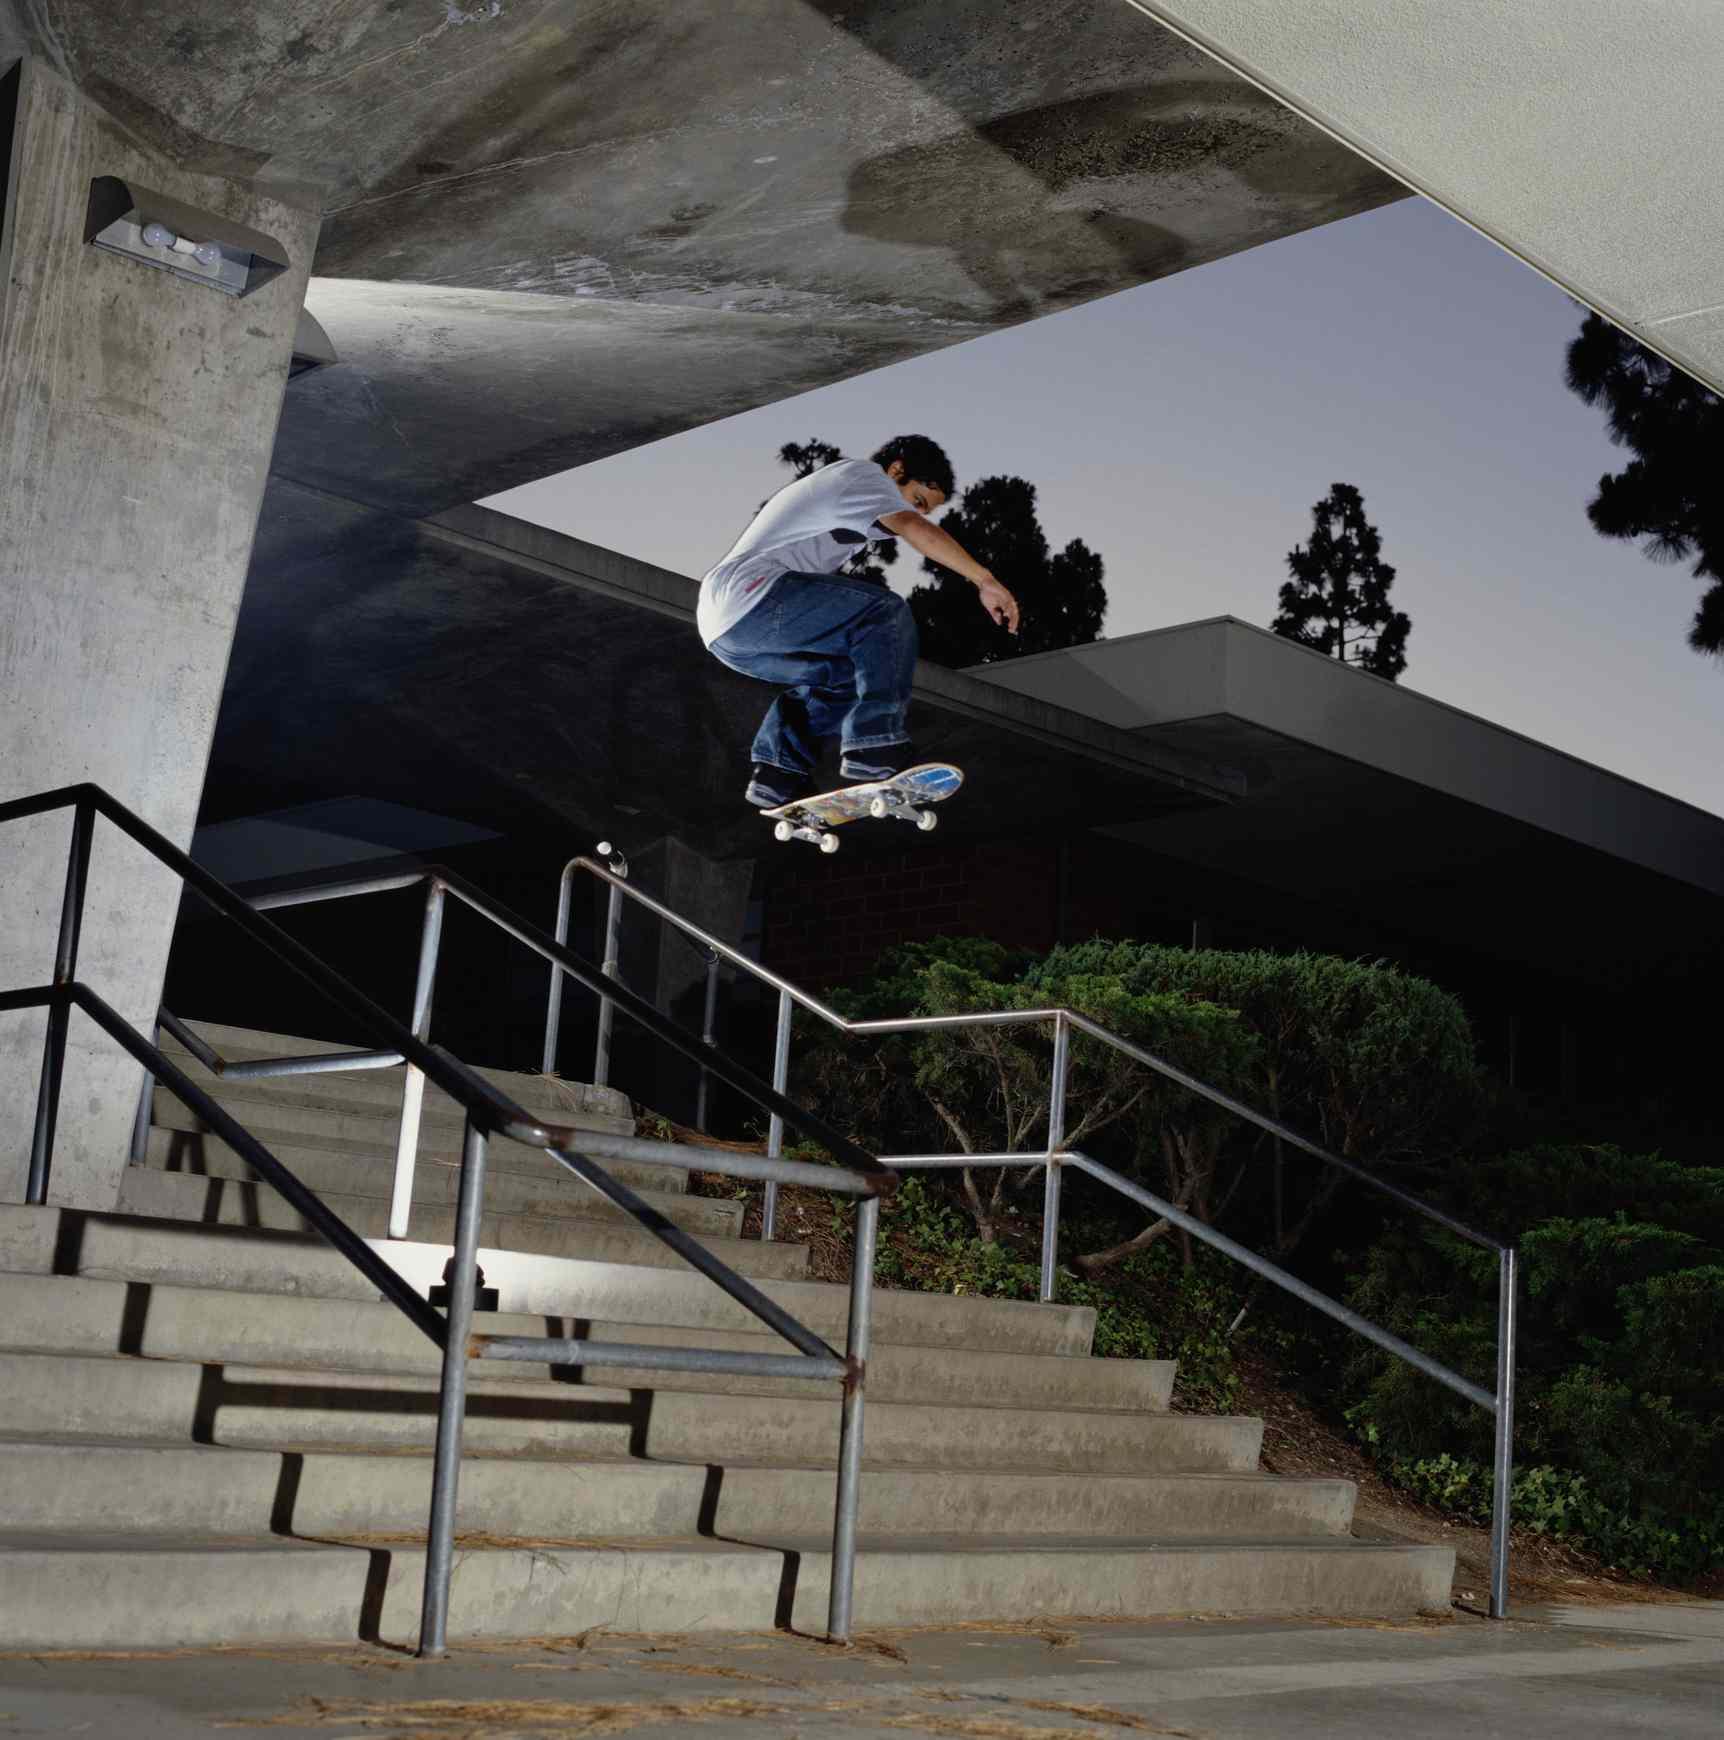 Skateboarder jumping stairway, mid air